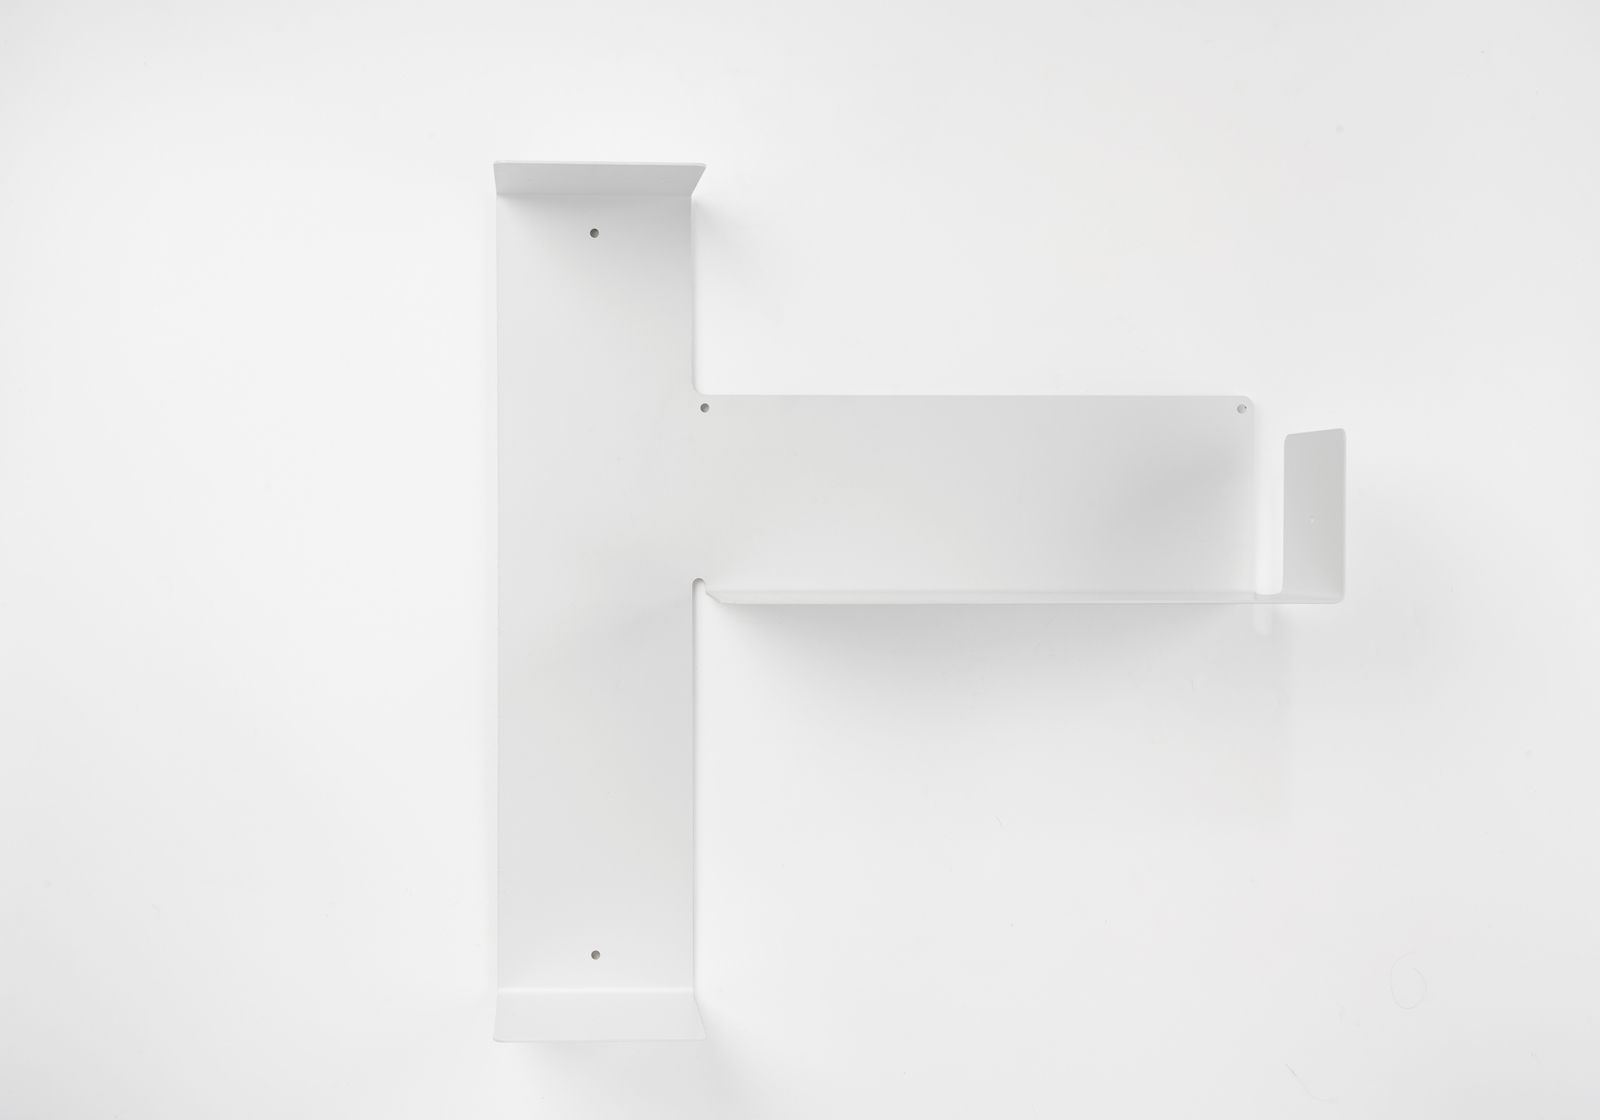 asymmetrisches dvd regal t rechts 60x60 cm stahl. Black Bedroom Furniture Sets. Home Design Ideas